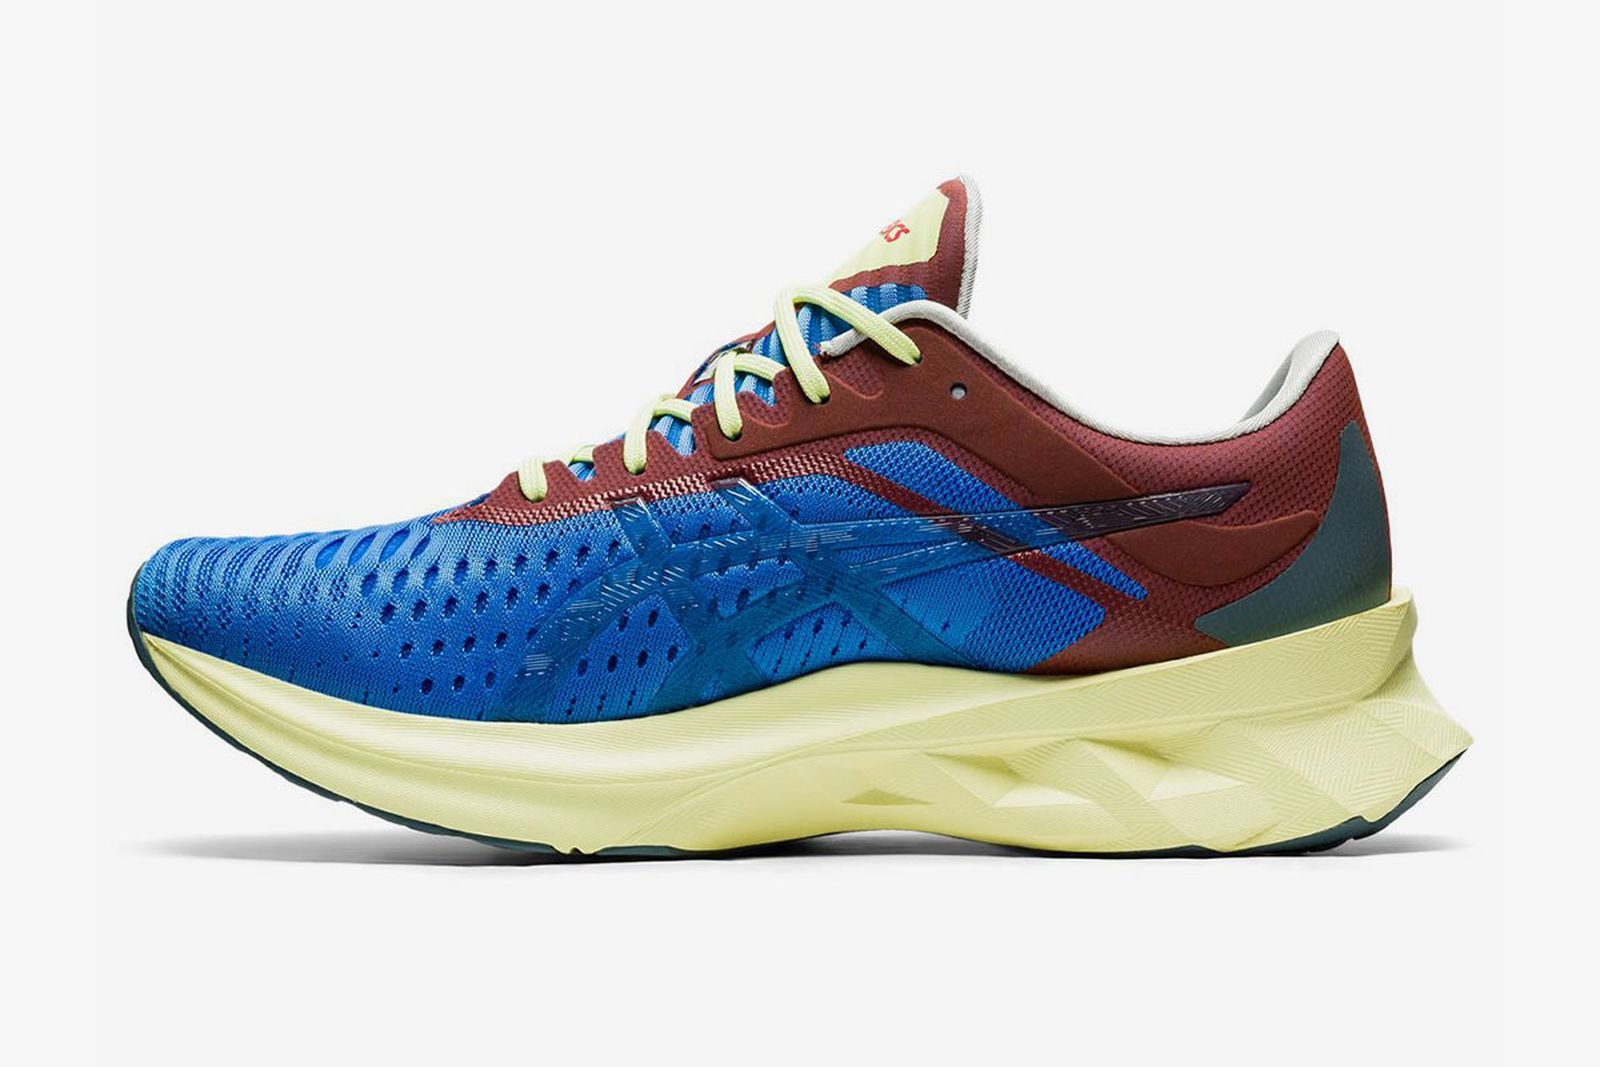 affix x asics novablast sneaker product shot blue